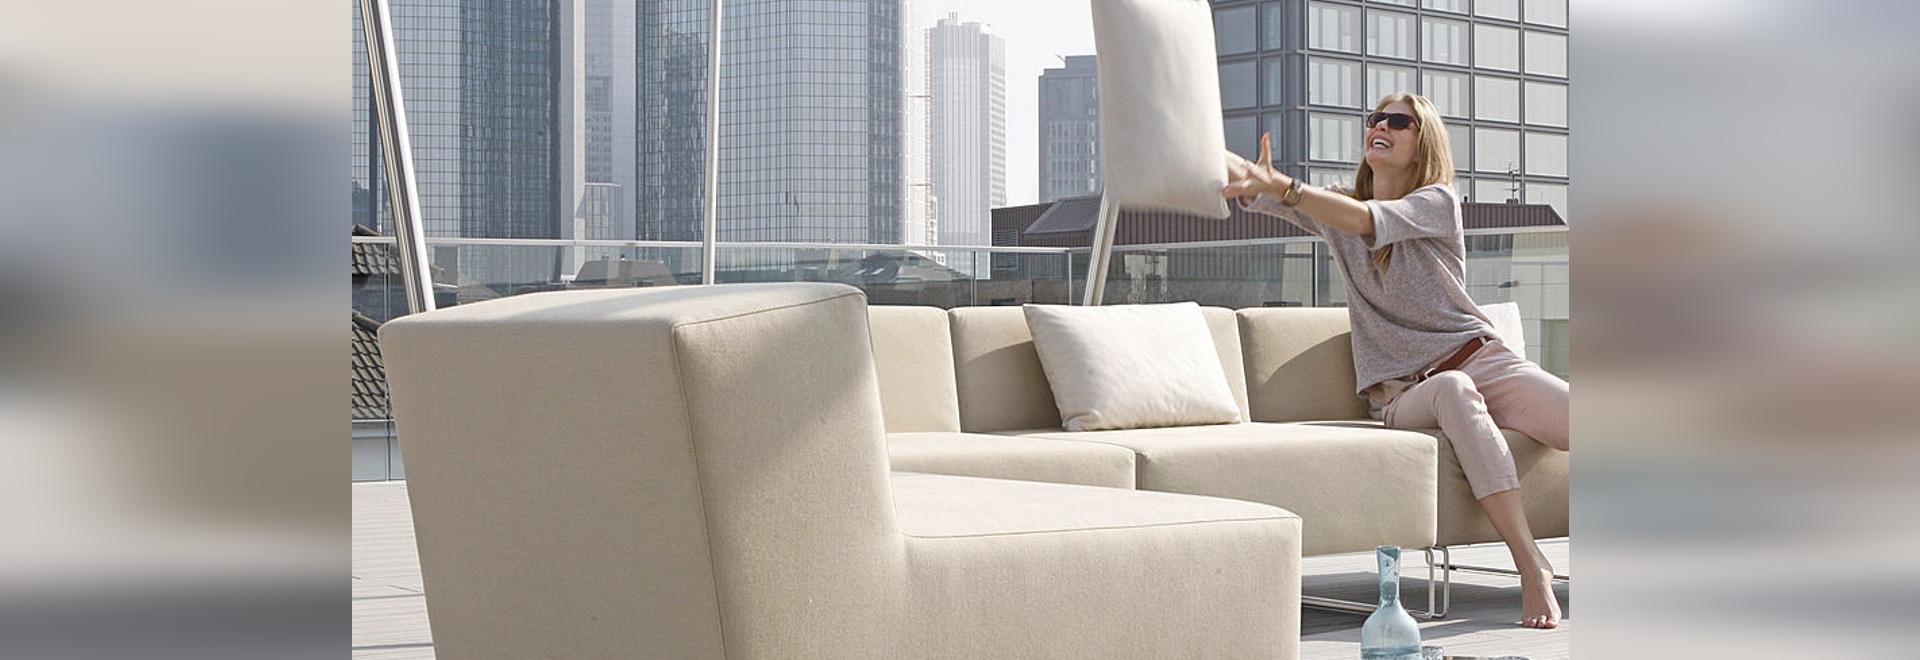 the modular jam garden lounge furniture offers comfortable and  - the modular jam garden lounge furniture offers comfortable and modernseating